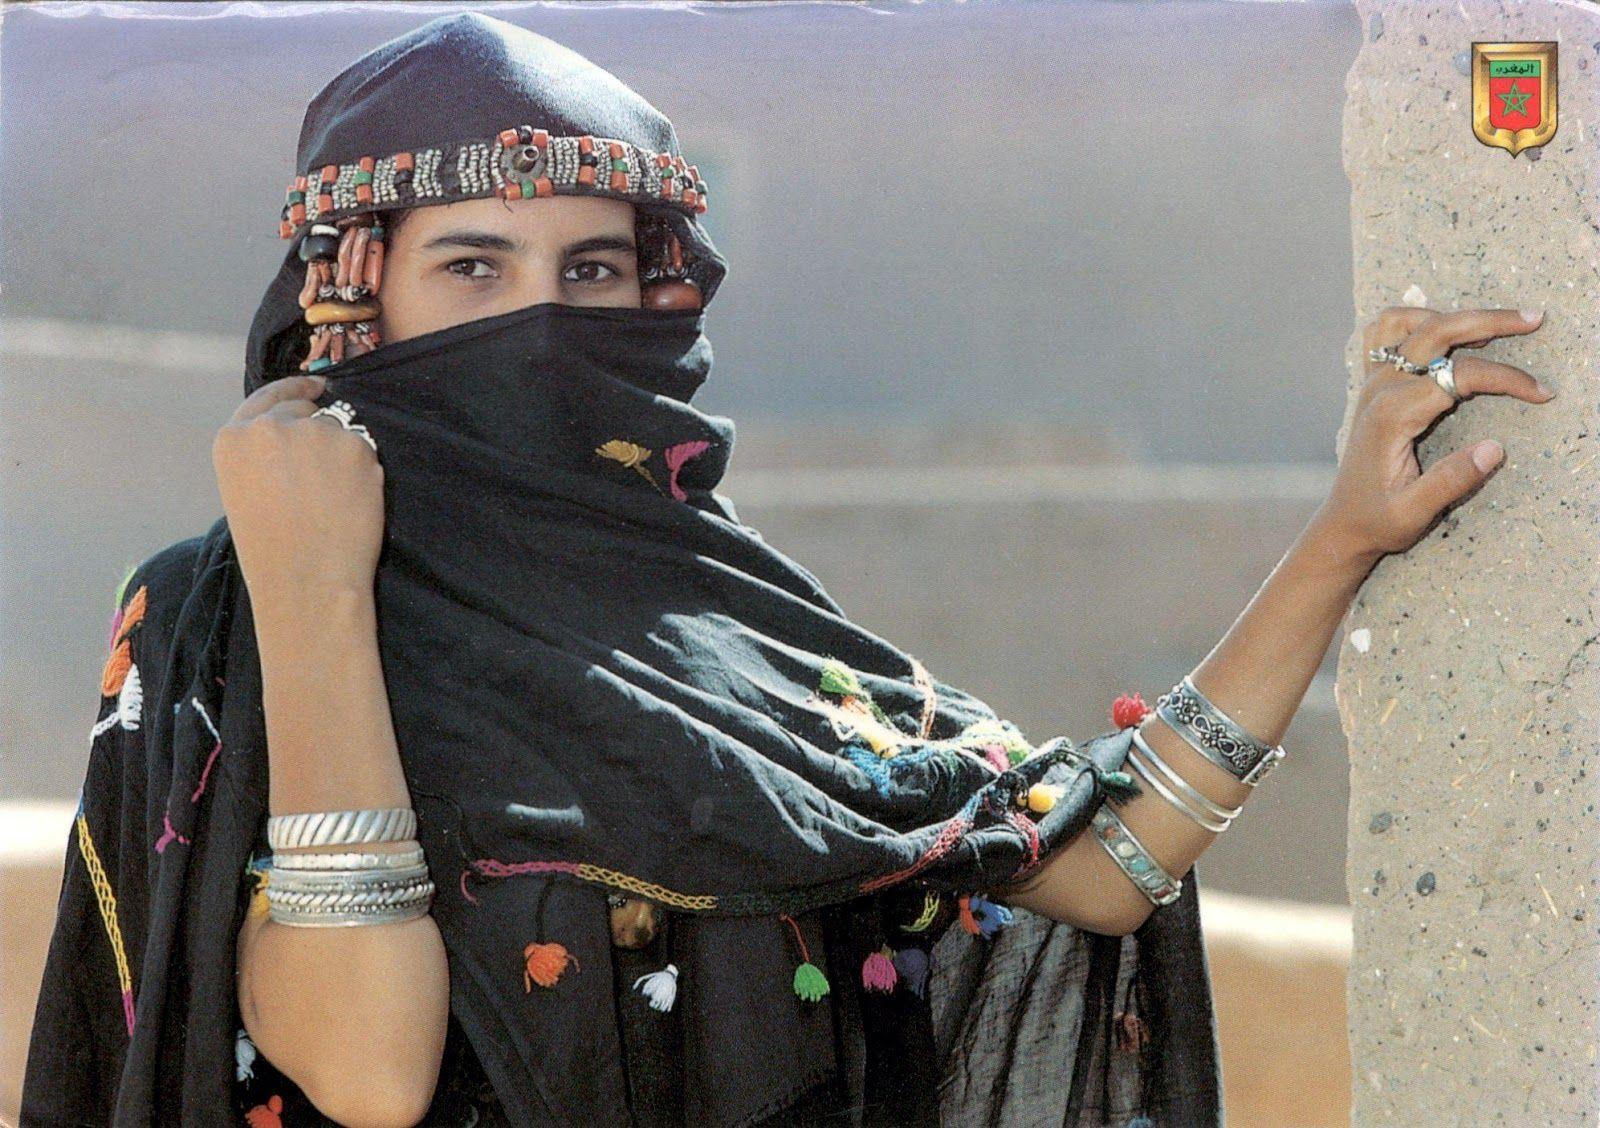 WORLD, COME TO MY HOME!: 0545, 1914 MOROCCO - Berber women   Africa people, Berber women, Berber